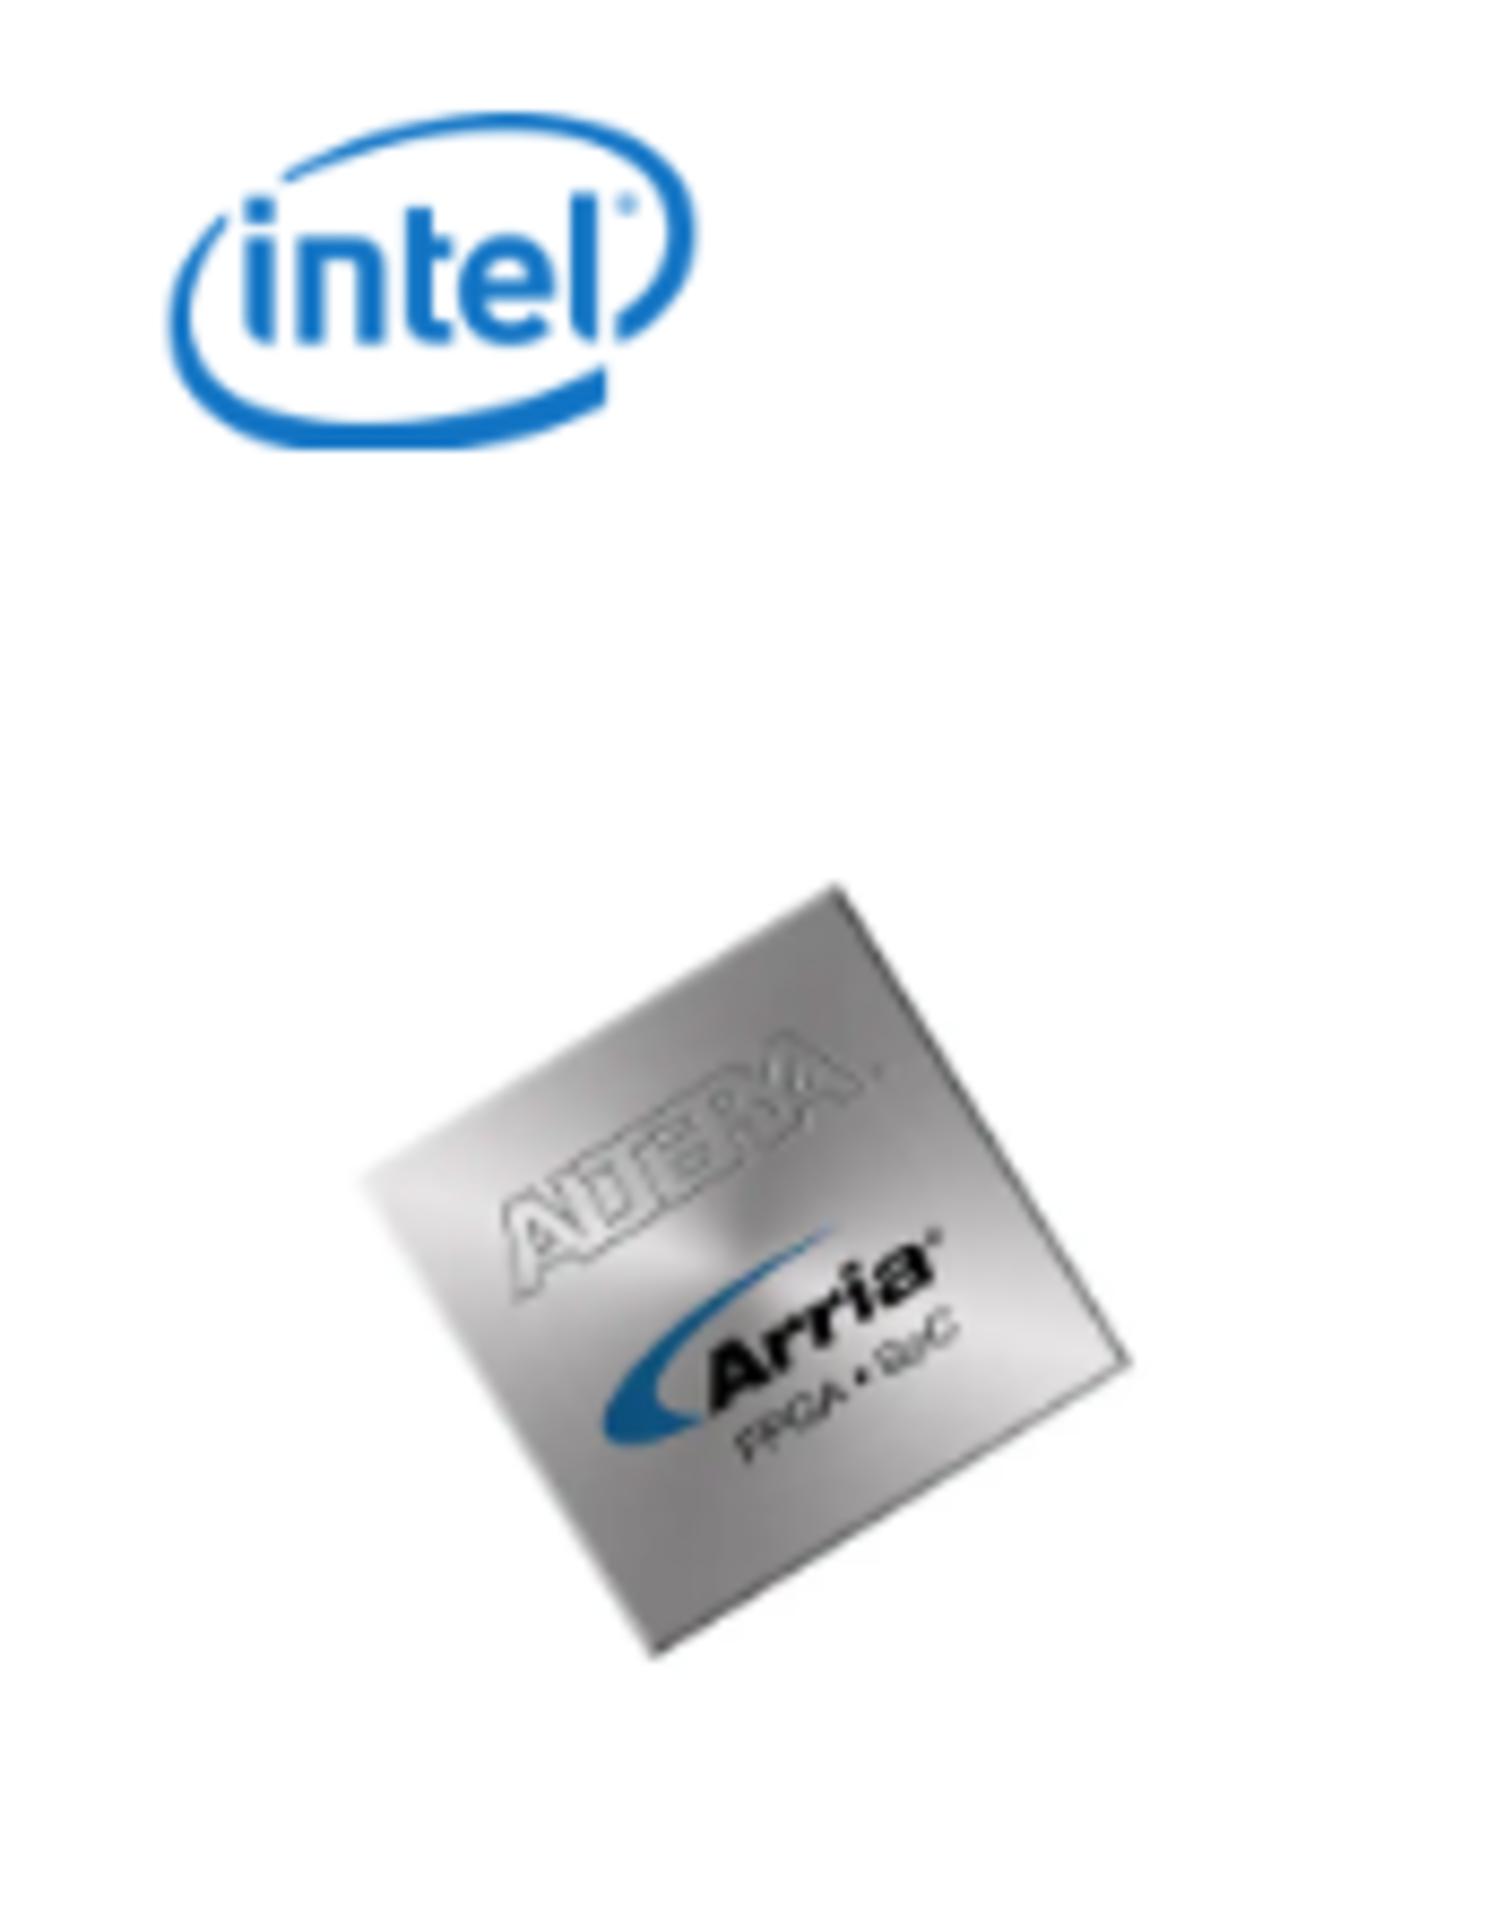 Intel 10AX115N1F45E1SG, QTY 48, FPGA Arria 10 GX Family 1150000 Cells 20nm Technology 0.